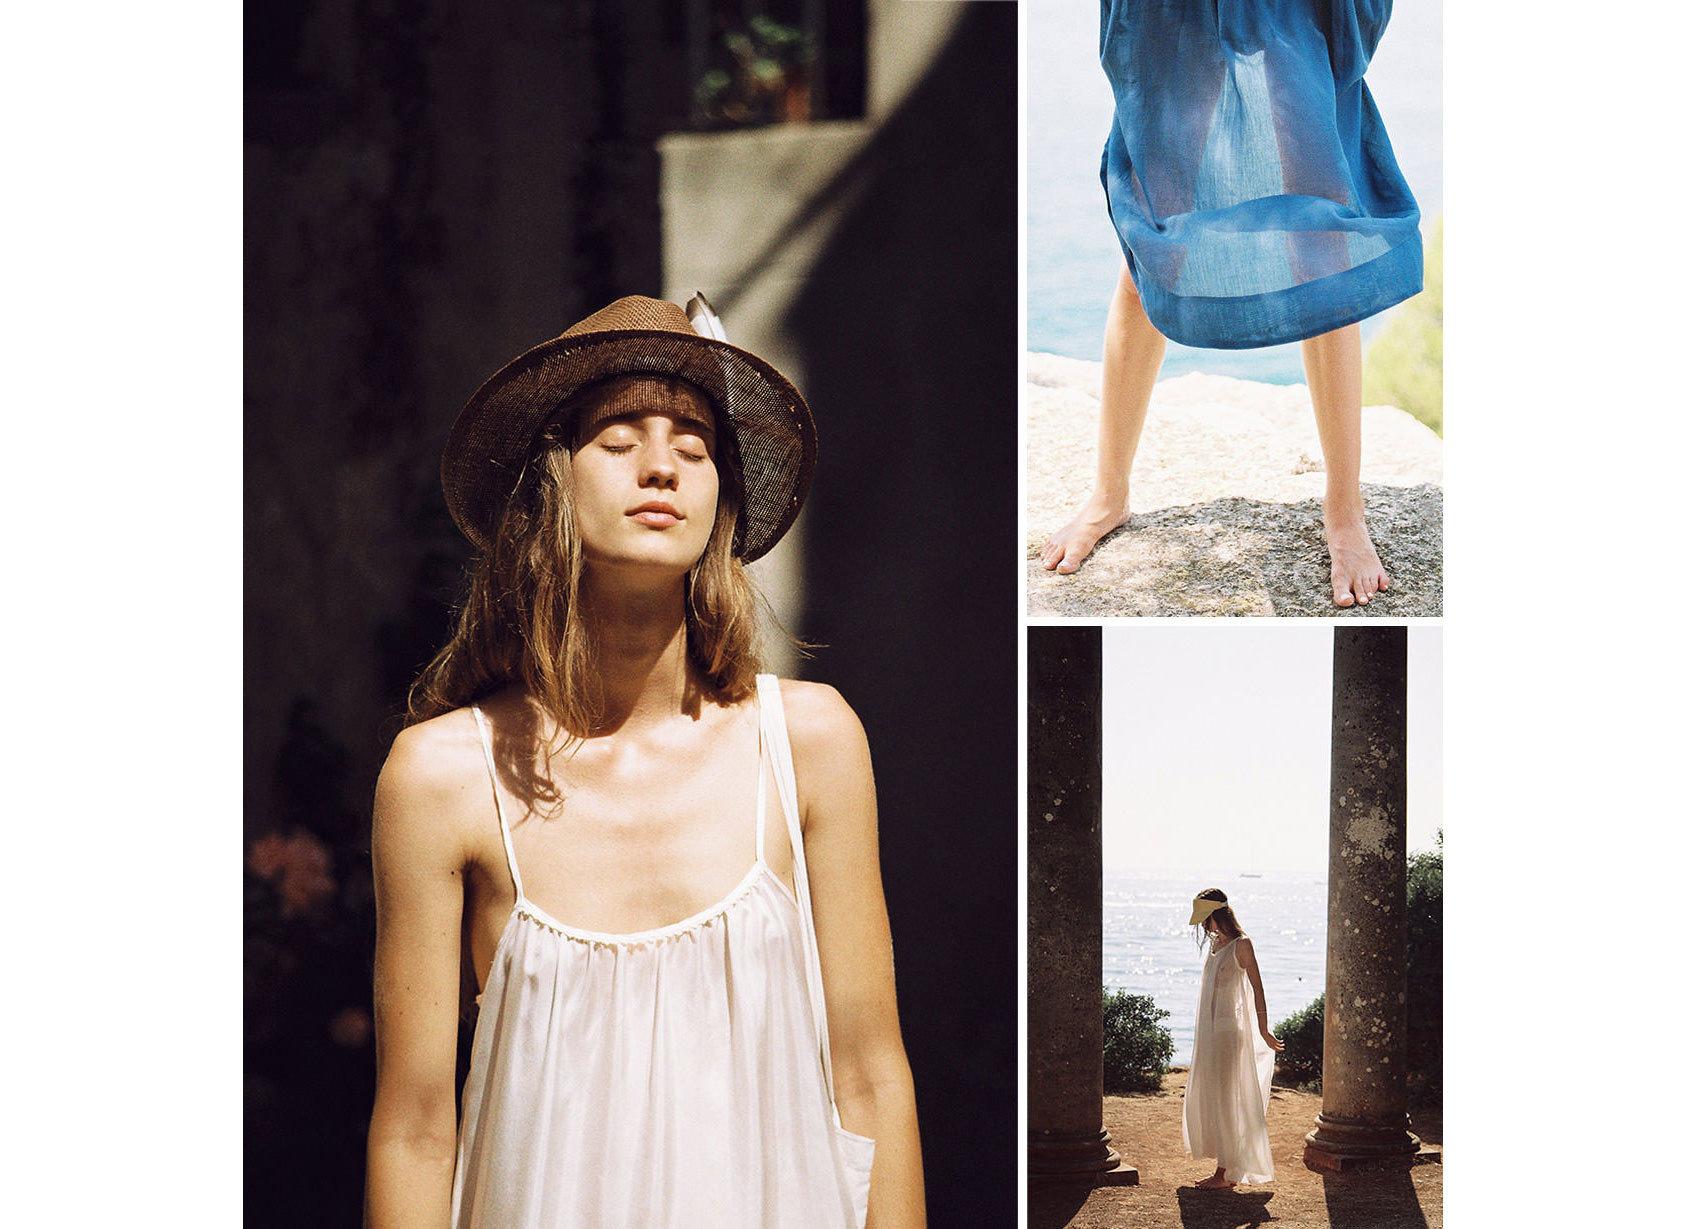 Style + Design Travel Shop person fashion model shoulder headgear fashion hair accessory outerwear photo shoot headpiece long hair girl hat neck posing